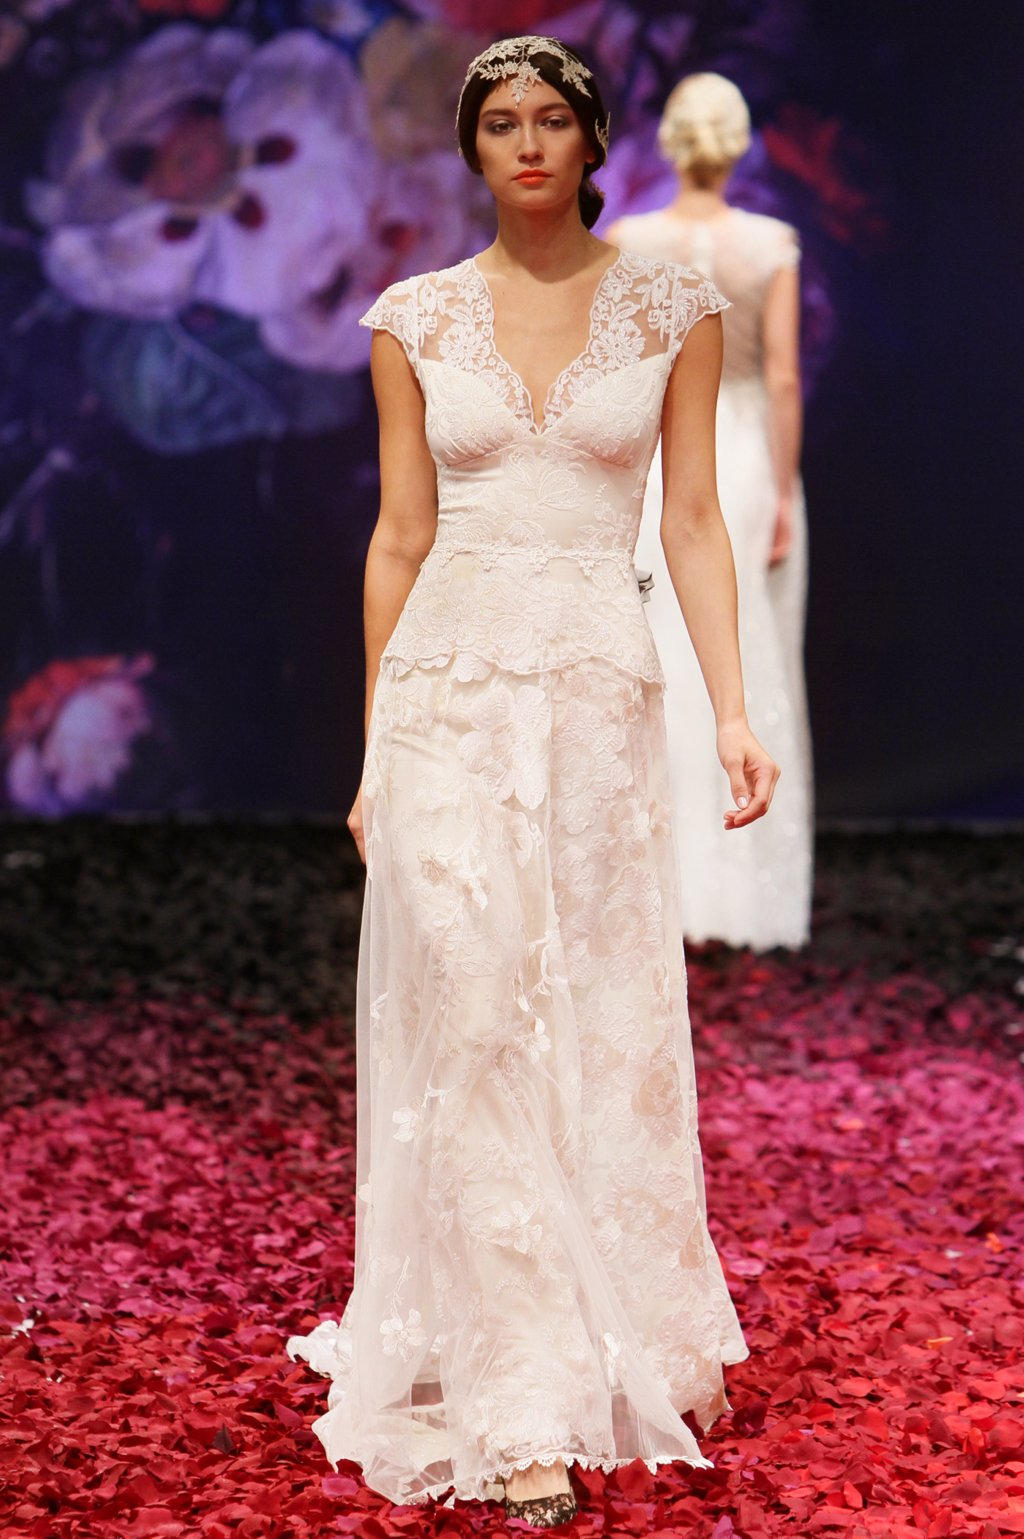 Rachel-wedding-dress-by-claire-pettibone-2014-still-life-bridal-collection.full